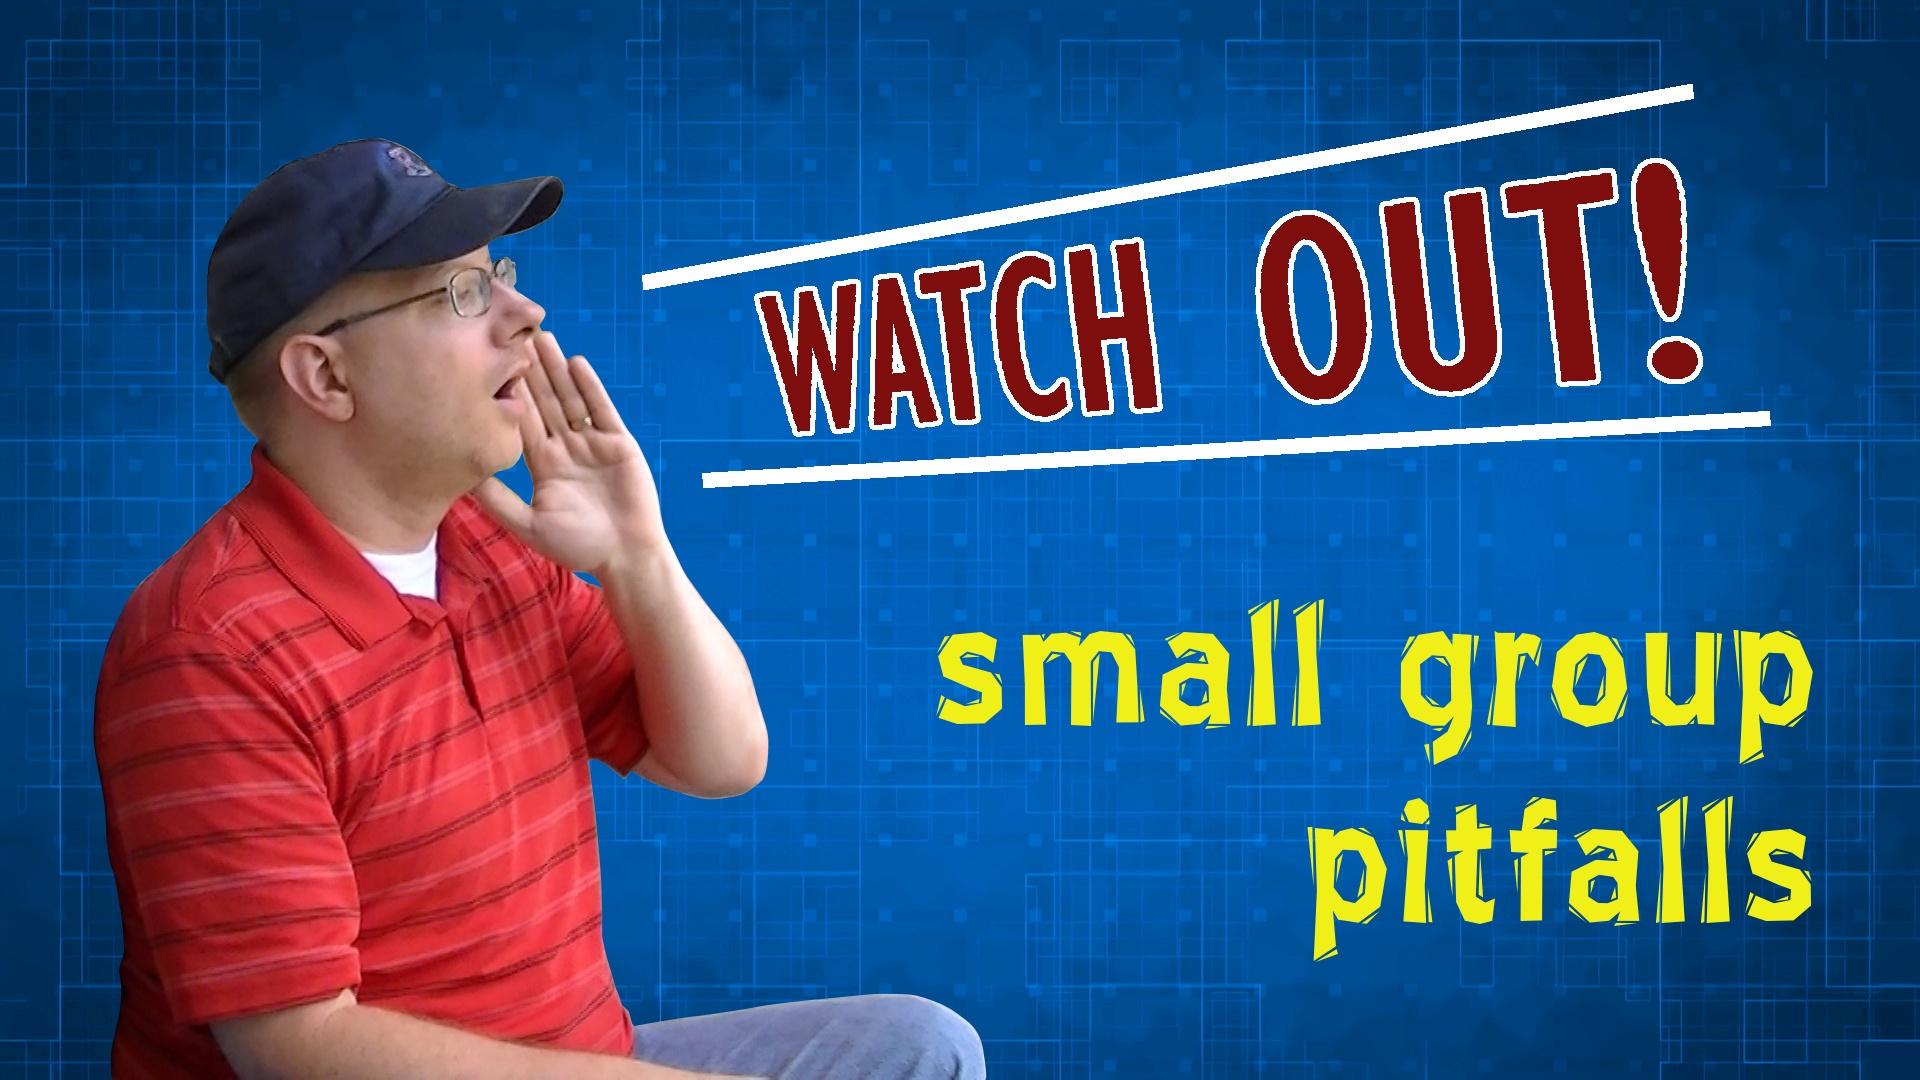 John Rothra saying Watch Out for small group pitfalls